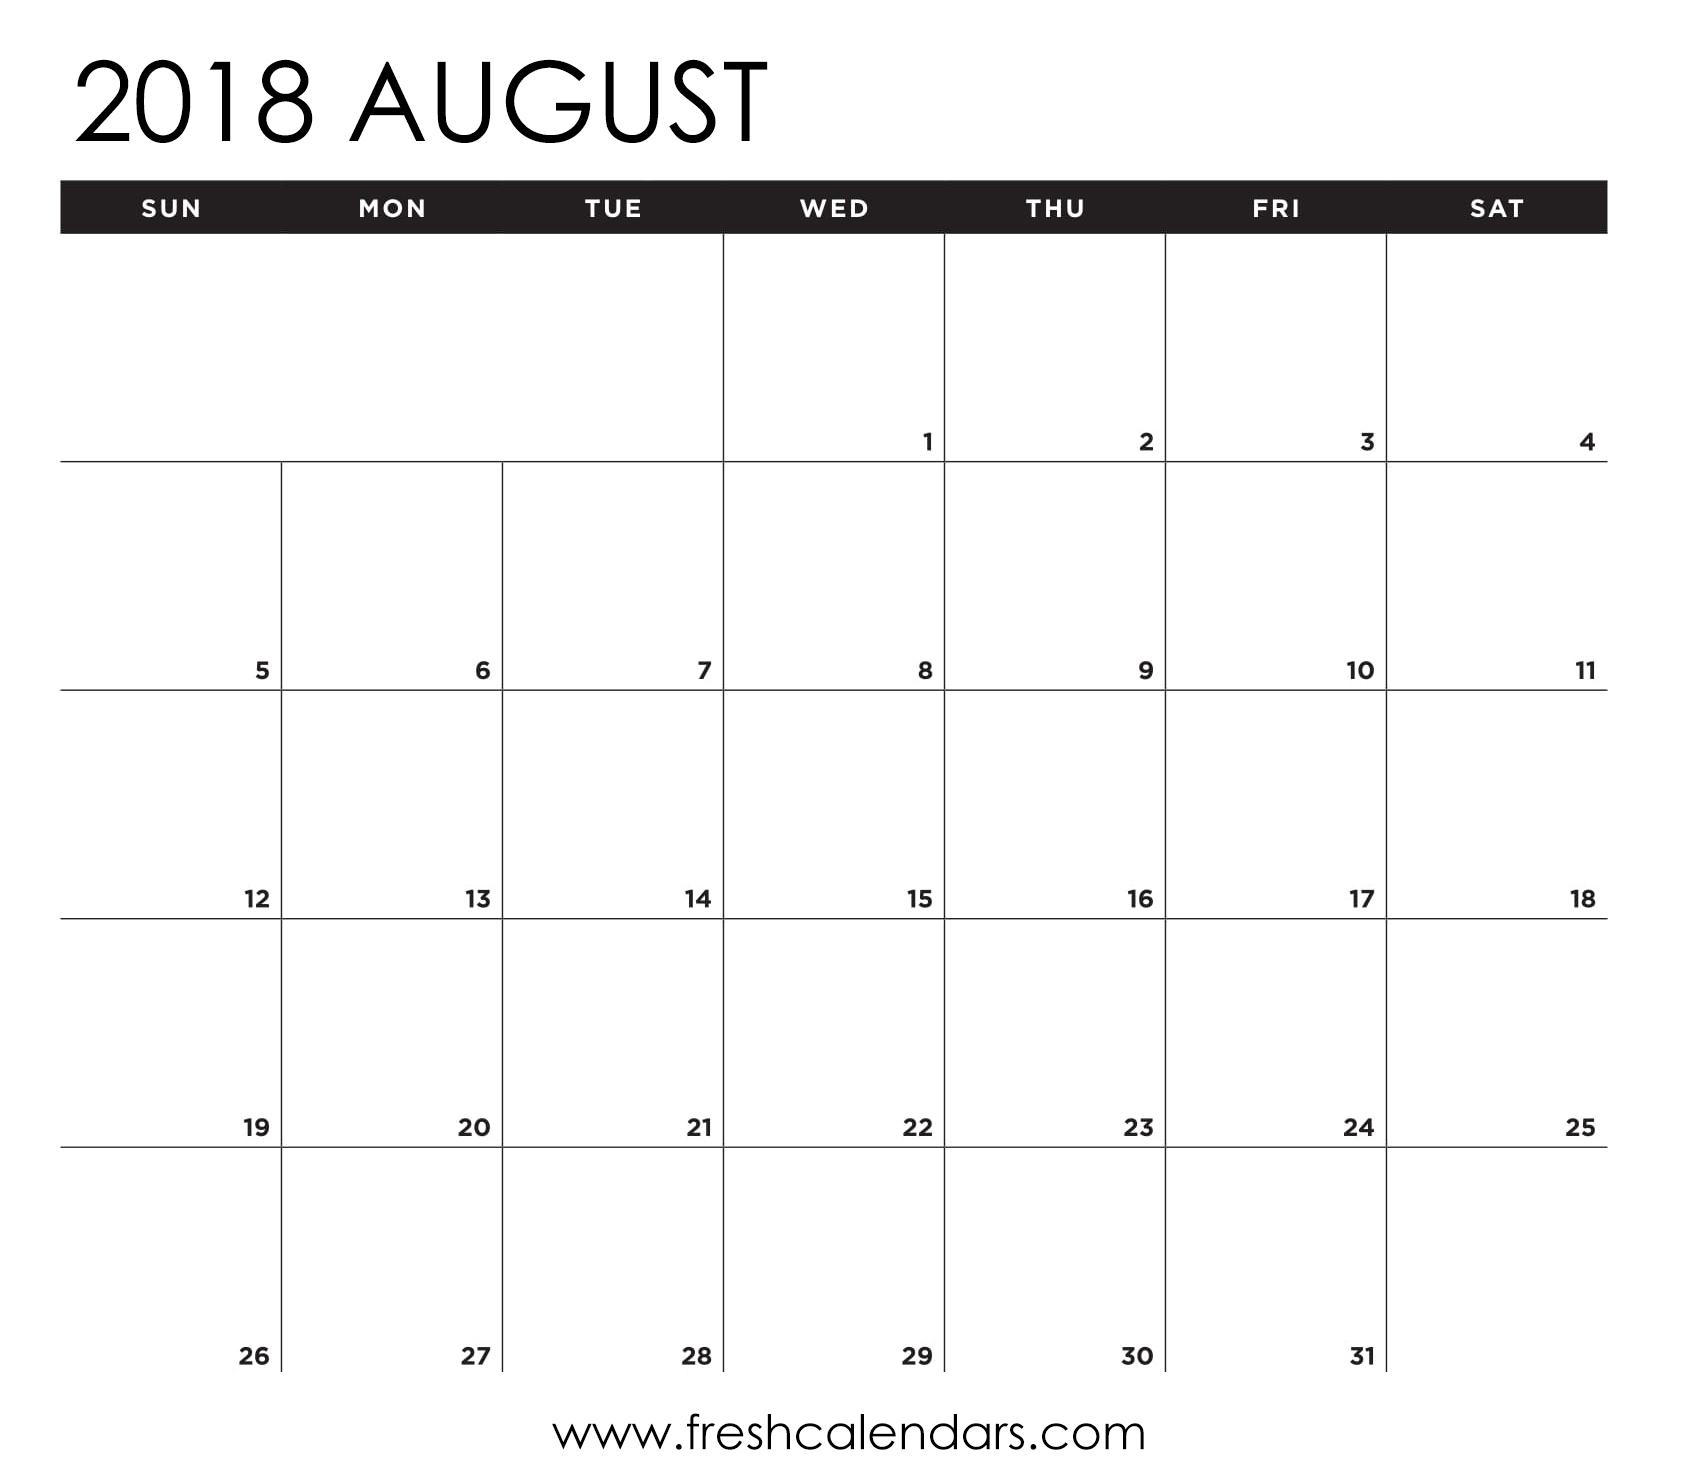 August 2018 Calendar Printable - Fresh Calendars regarding Blank Calendar Template For August